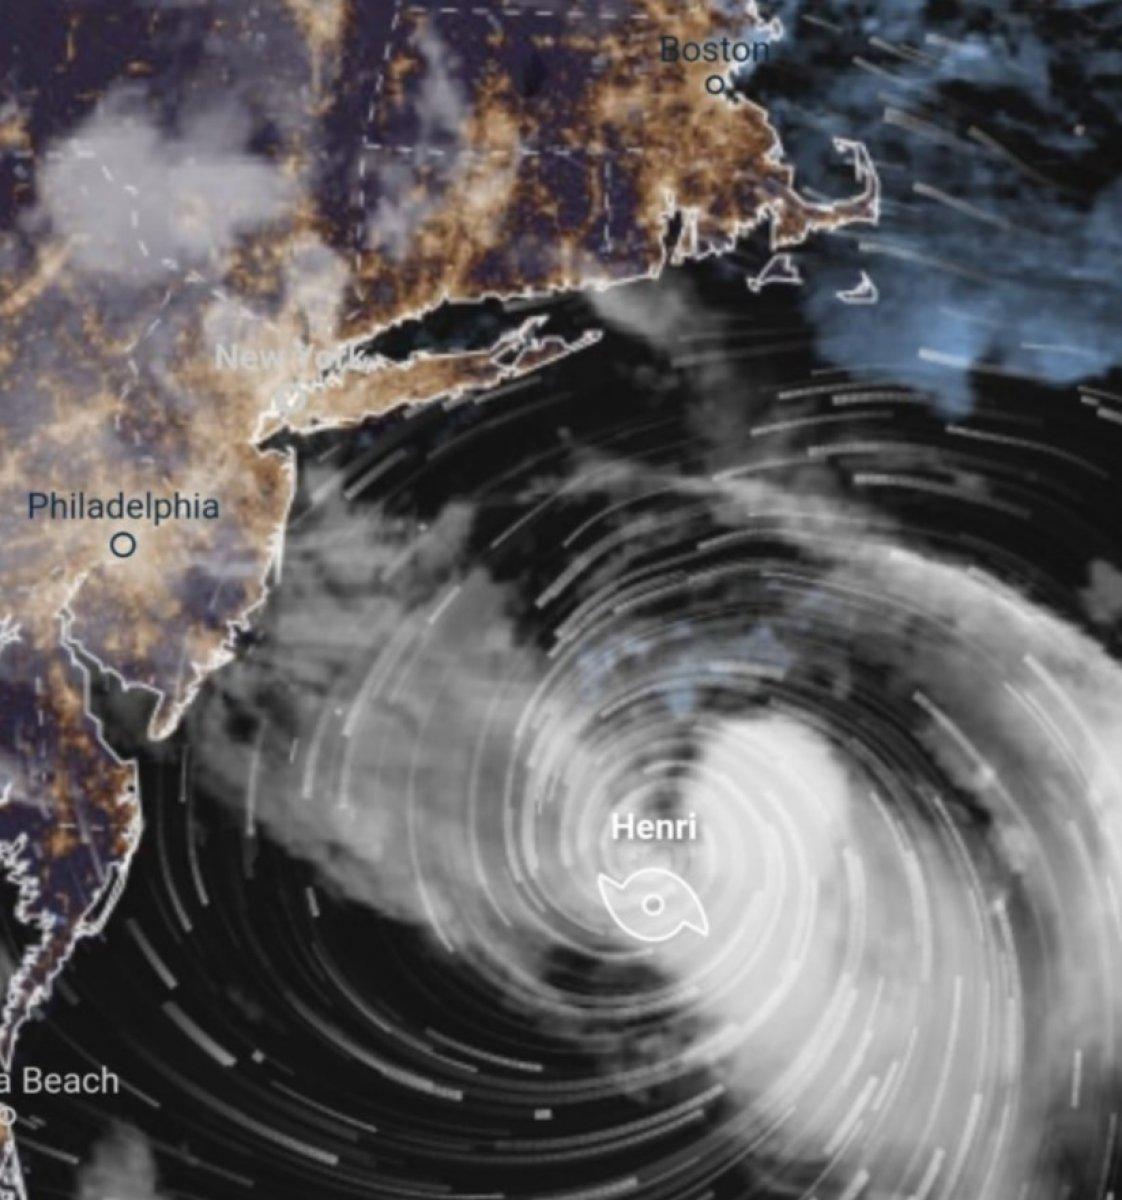 New York'ta Henri Kasırgası alarmı: OHAL ilan edildi #1